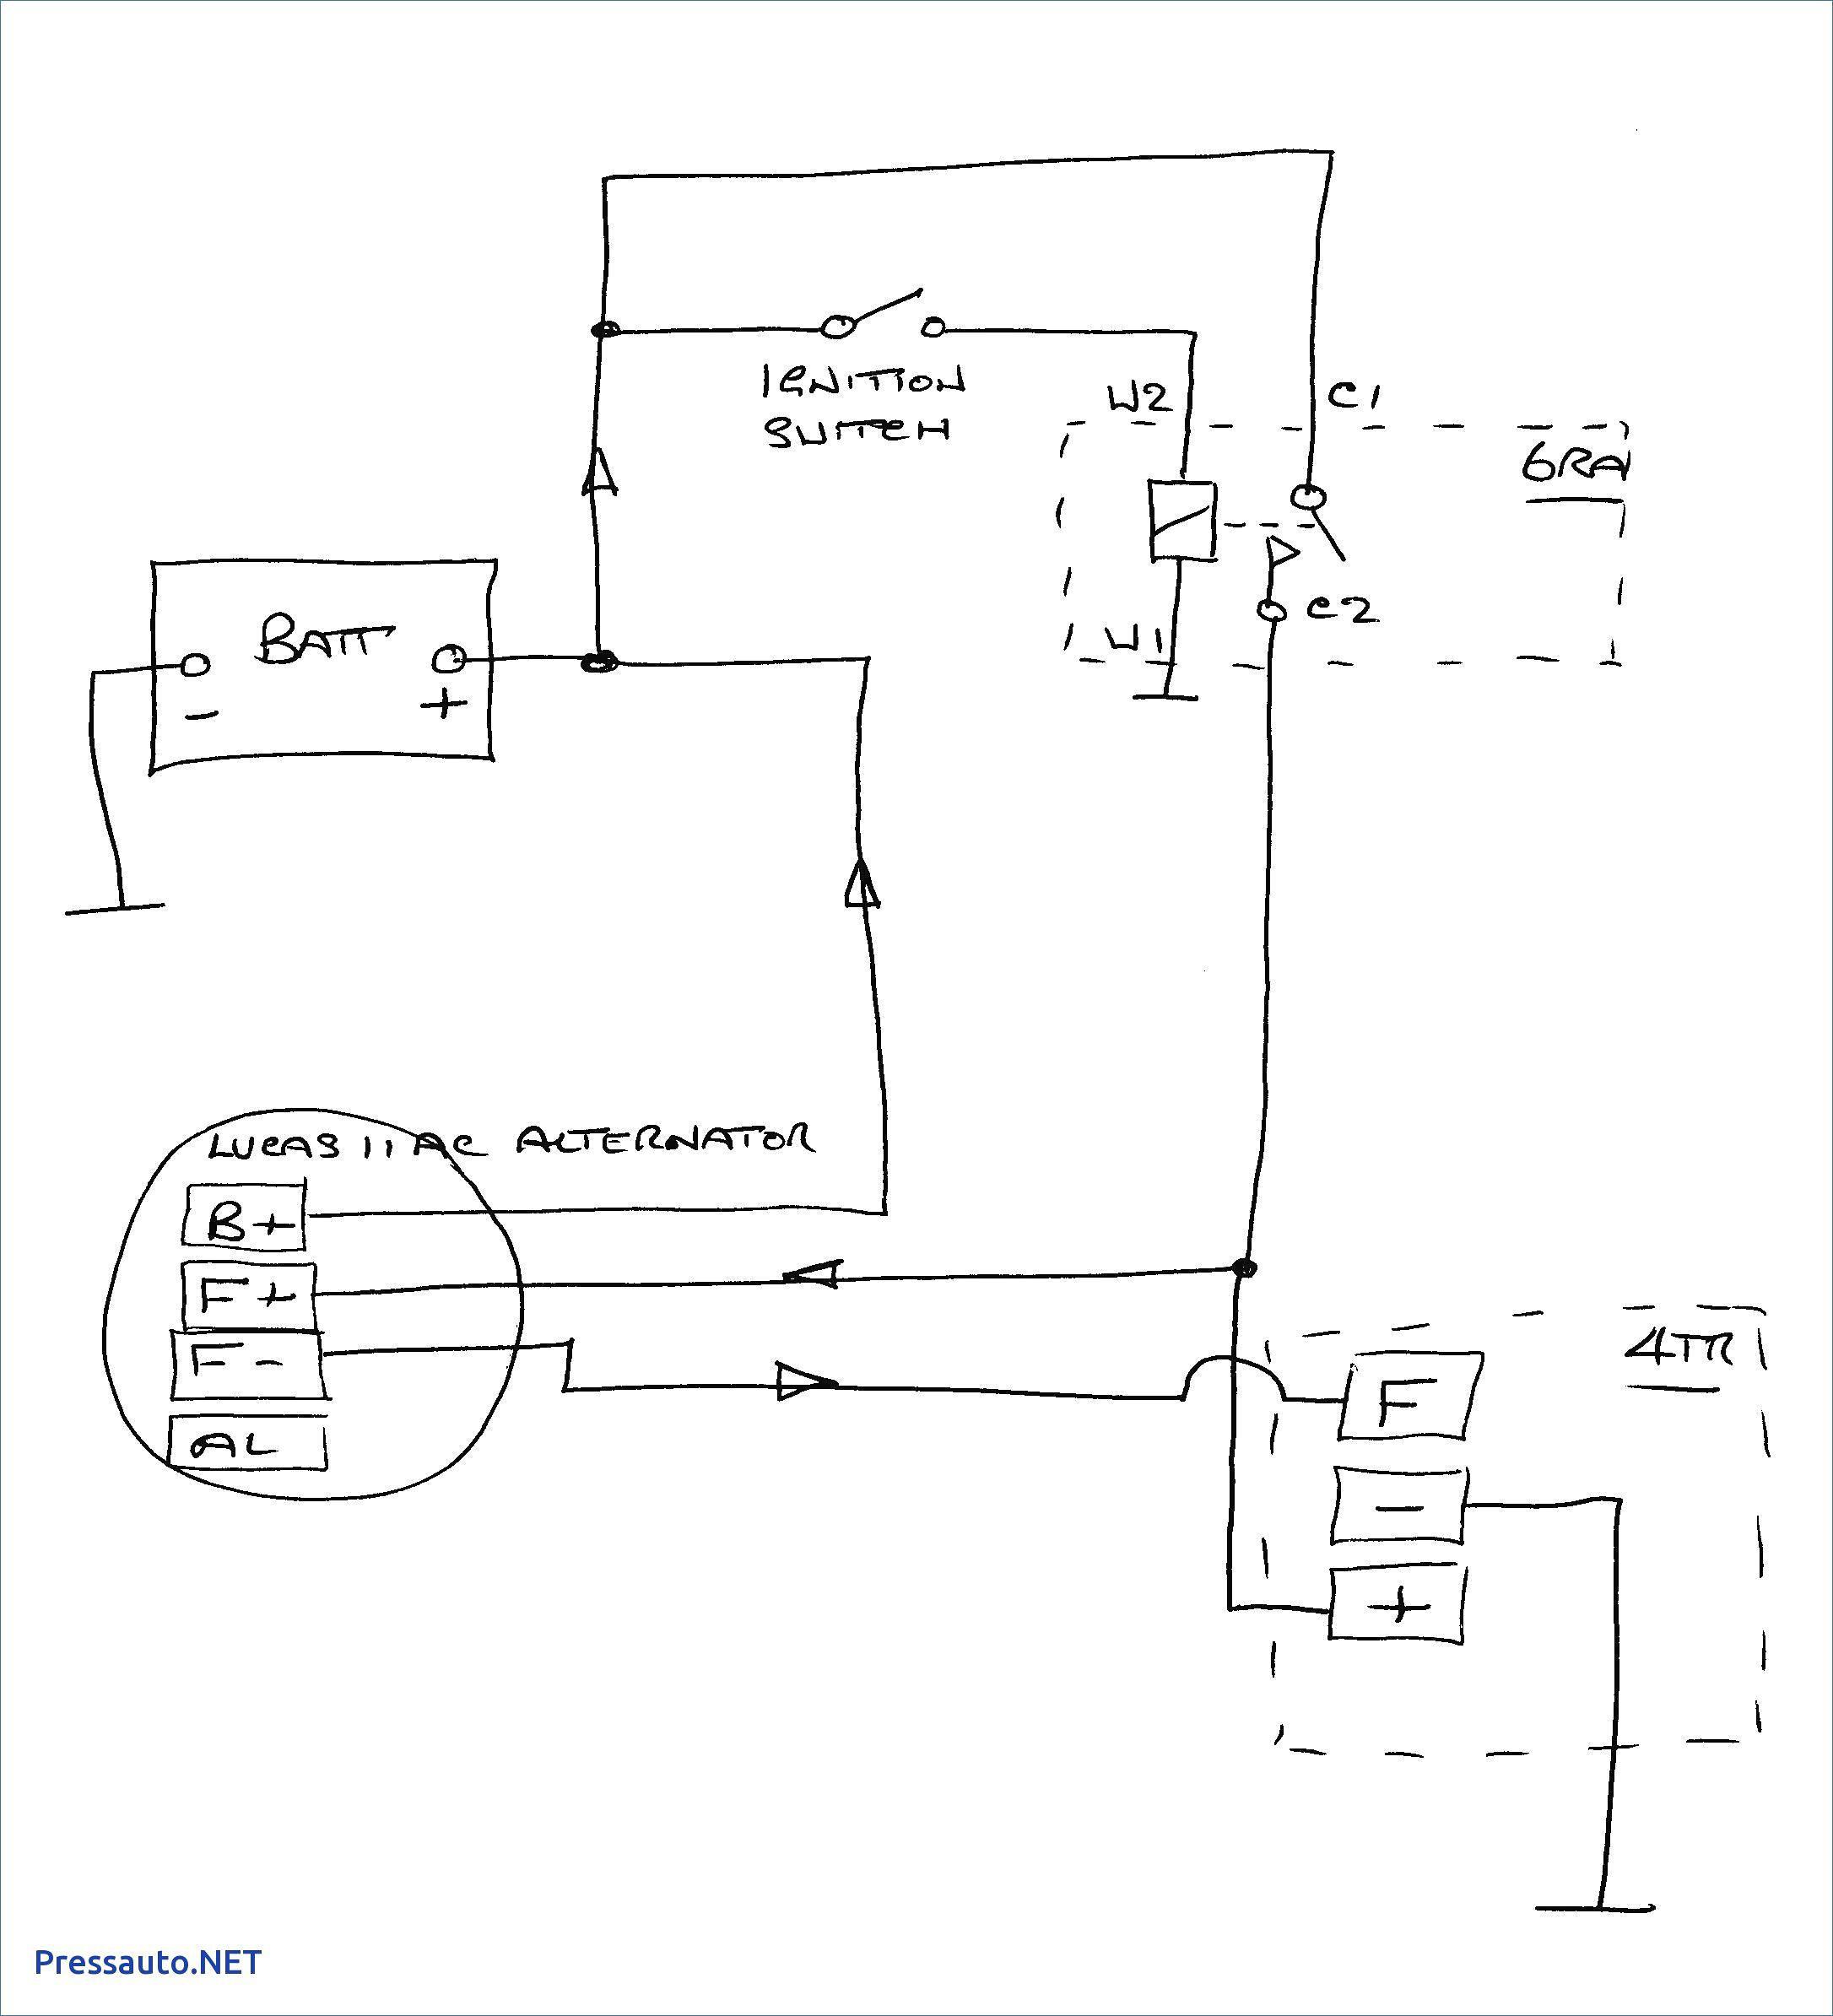 4 Wire Gm Alternator Wiring Diagram 12V | Wiring Diagram - Chevy 4 Wire Alternator Wiring Diagram